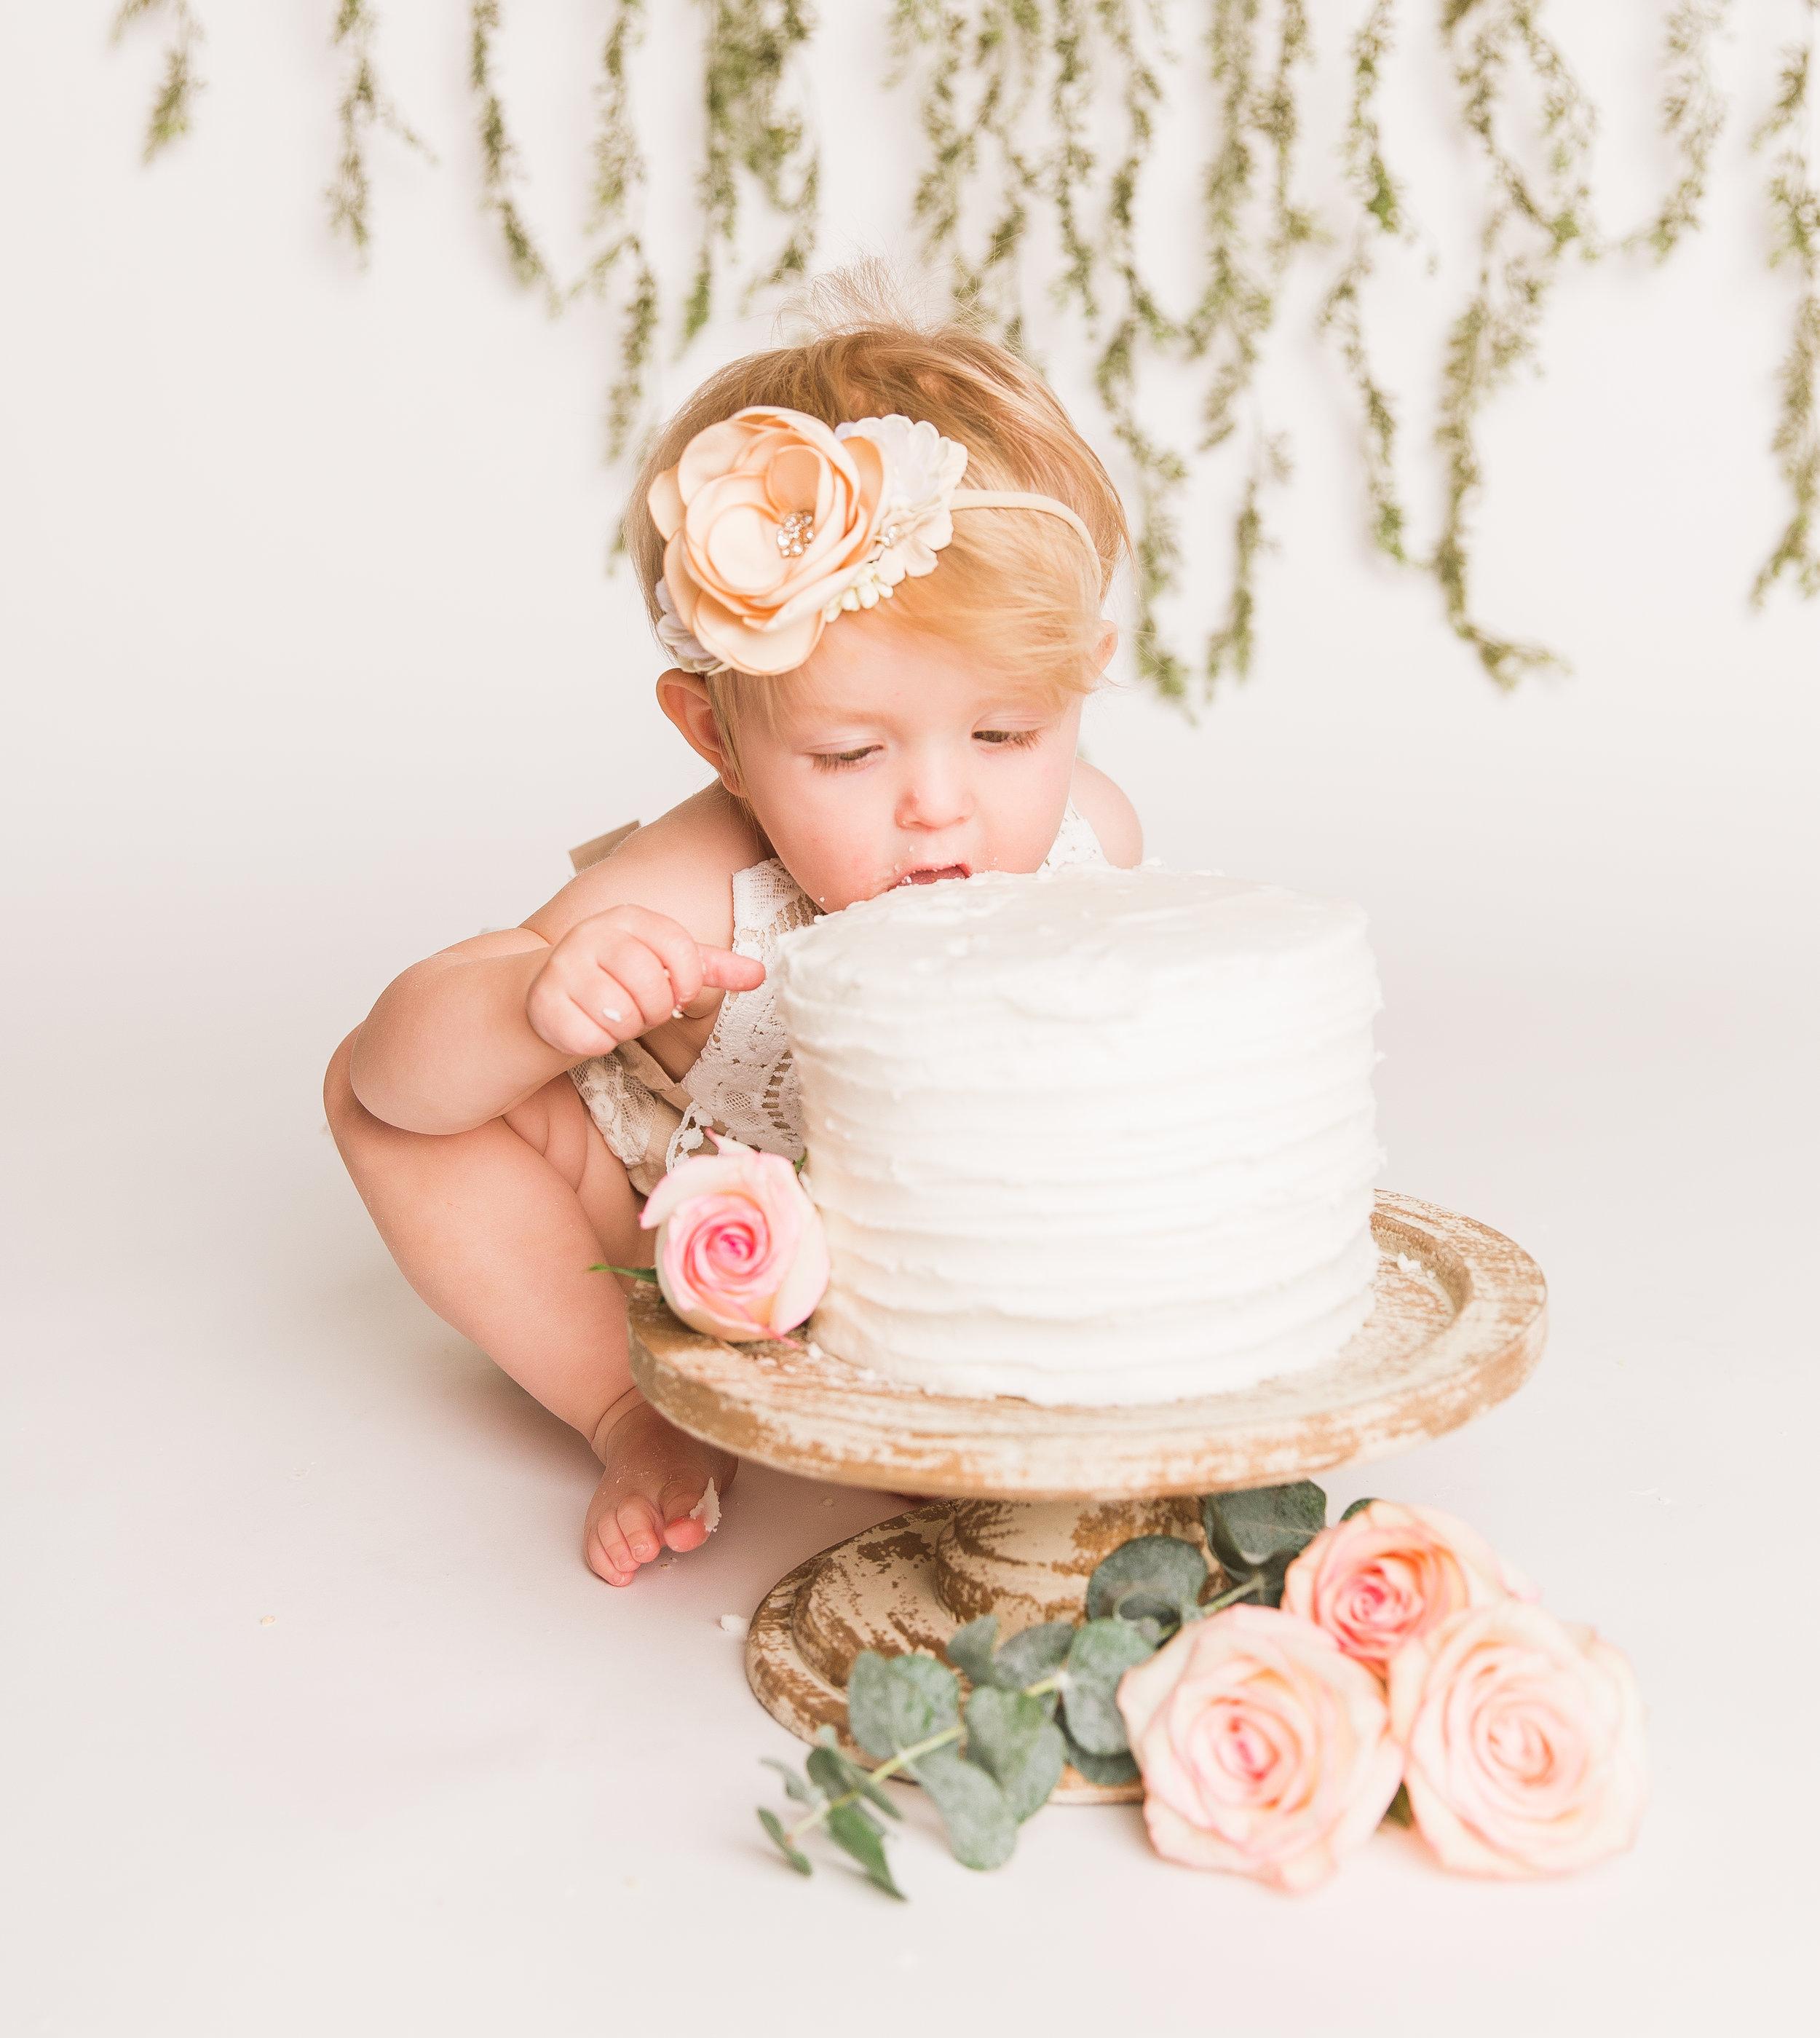 Kallie Cake Smash-Kallie Cake Smash-0069.jpg